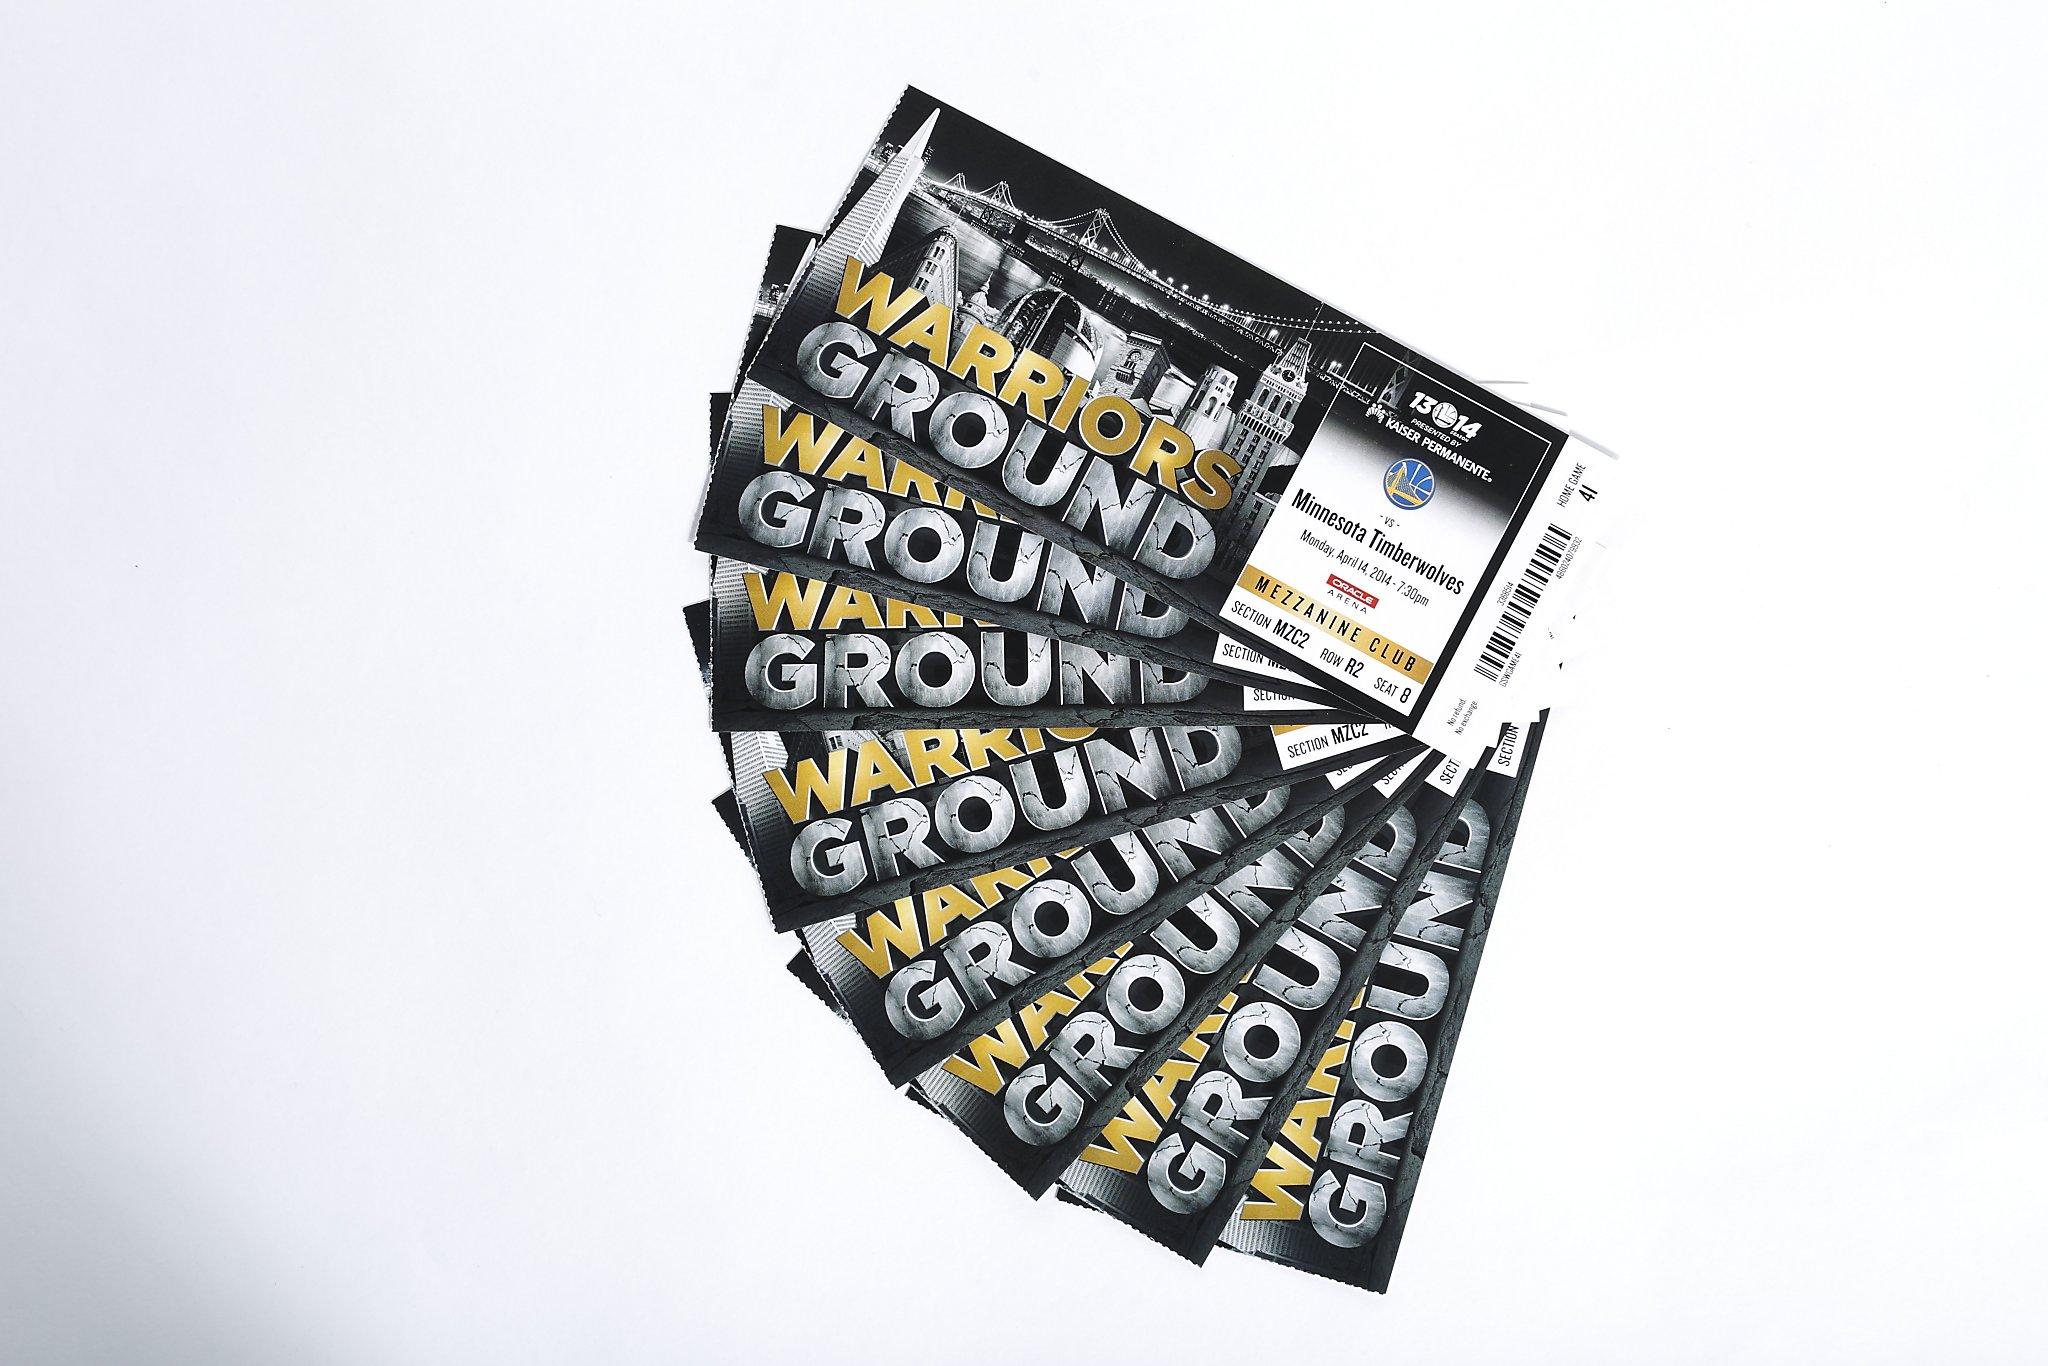 Warriors ticket resale rules prompt lawsuit - SFGate